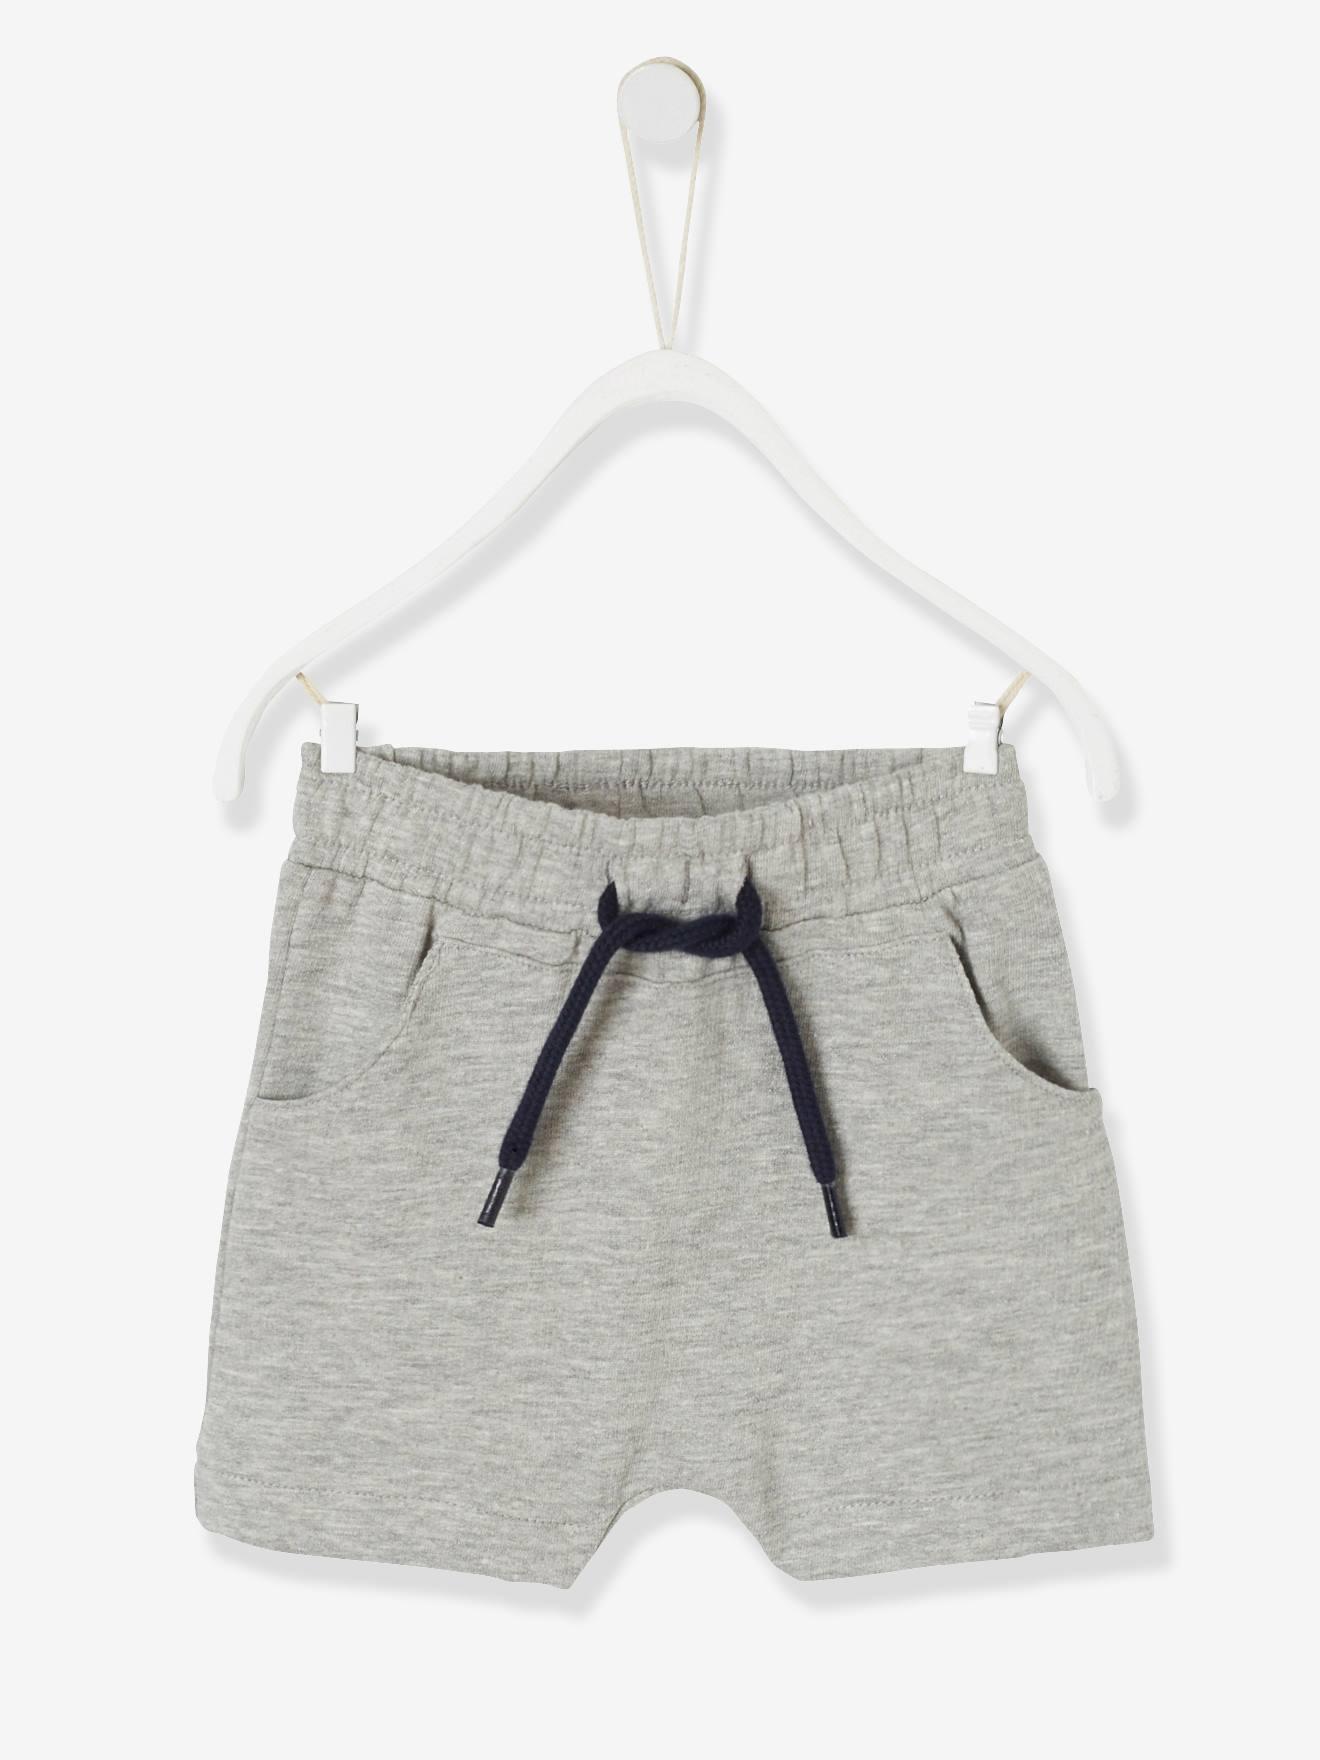 fcc2b5b06f261 Bermuda bébé garçon en molleton gris chiné - Vertbaudet